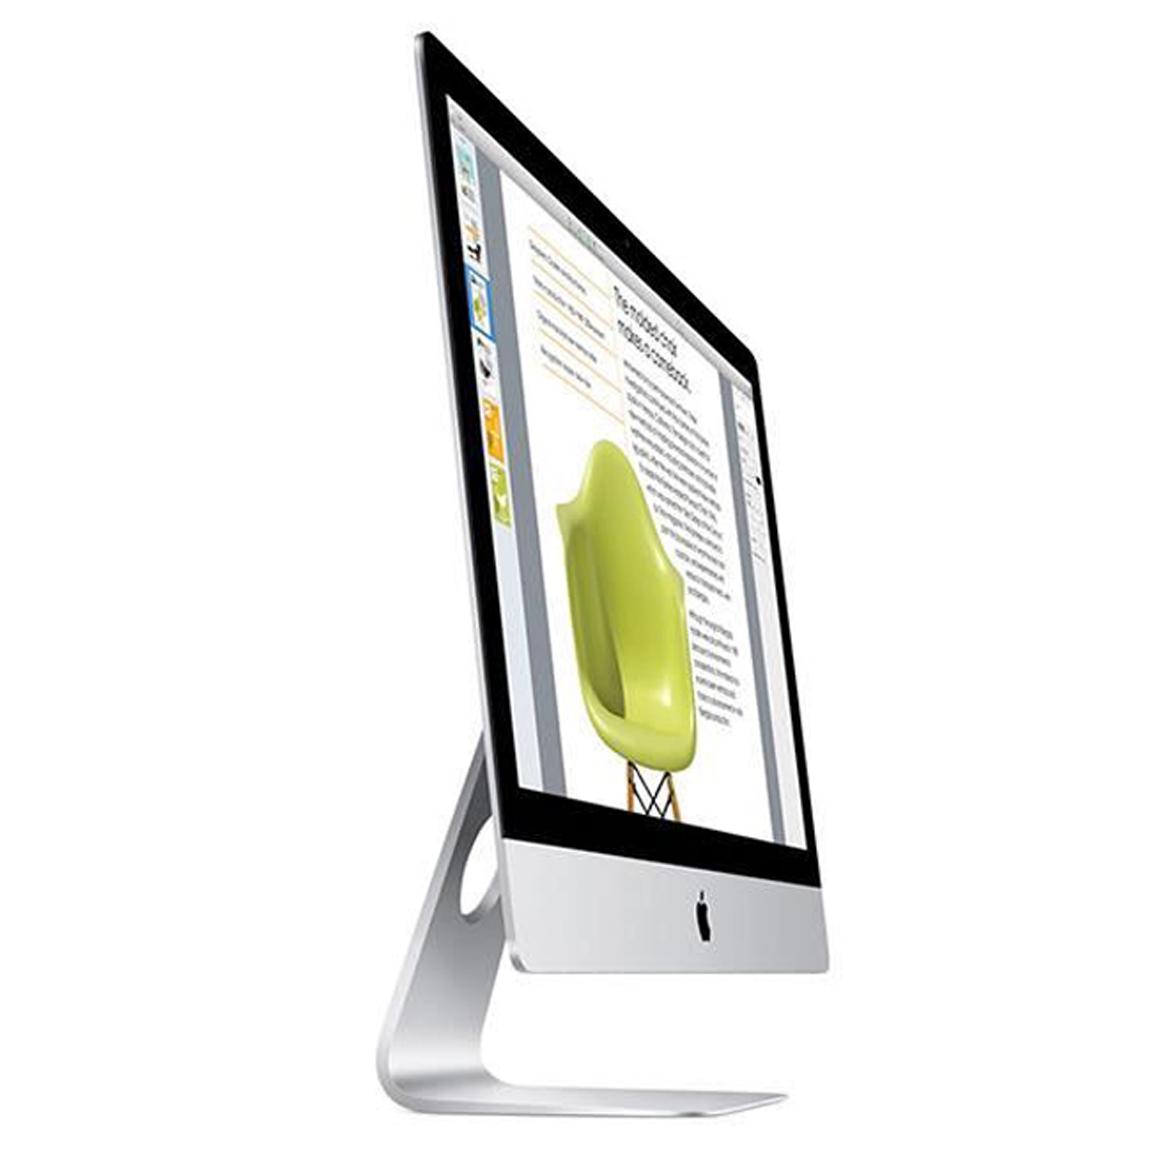 iMac MK462  Model 2015  27Inch / Core i5 2.8Ghz 8GB 1TB /  New 99%